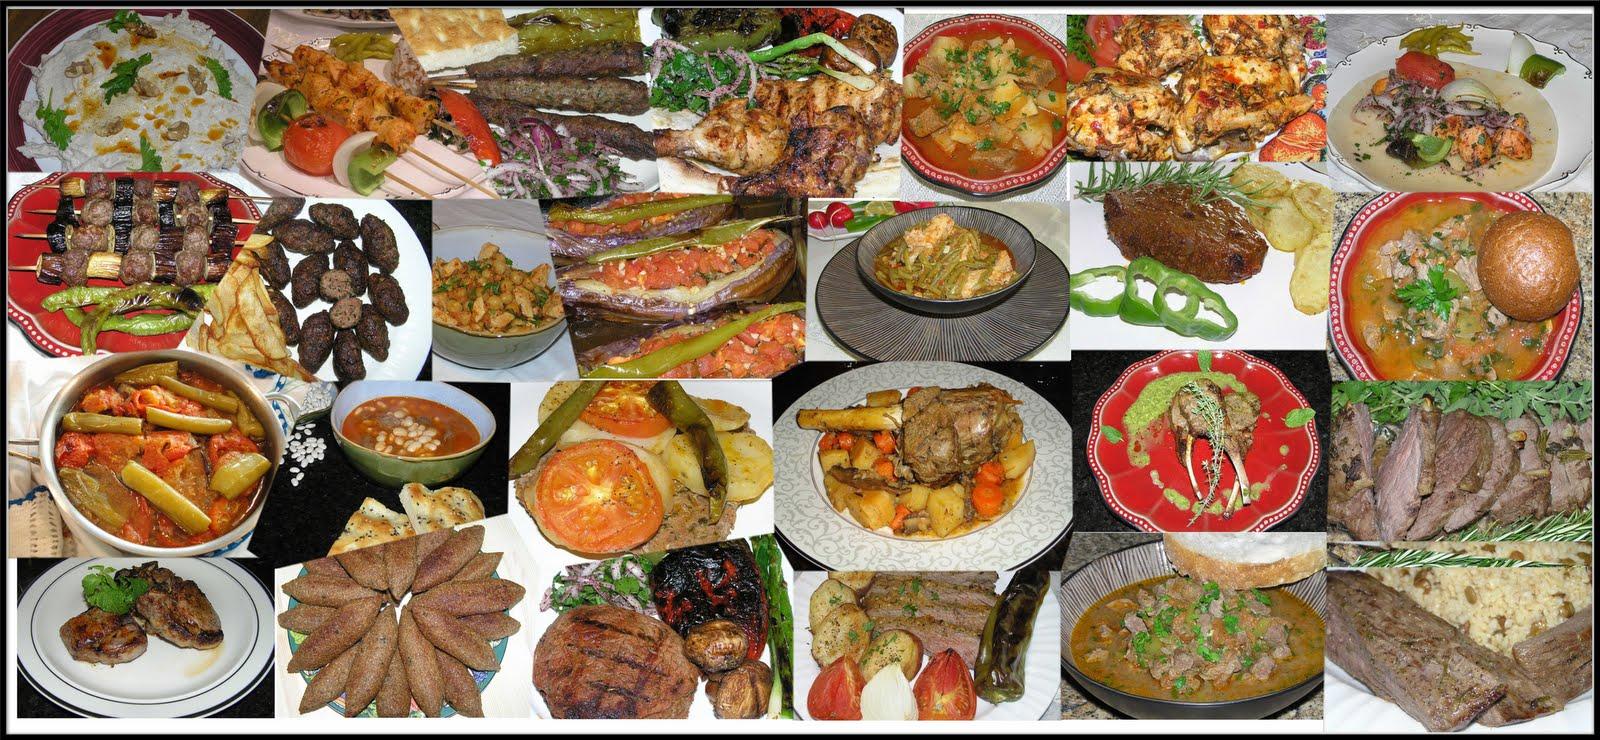 Baza e kuzhines turke eshte brumi me miell gruri per buken. krahas ...